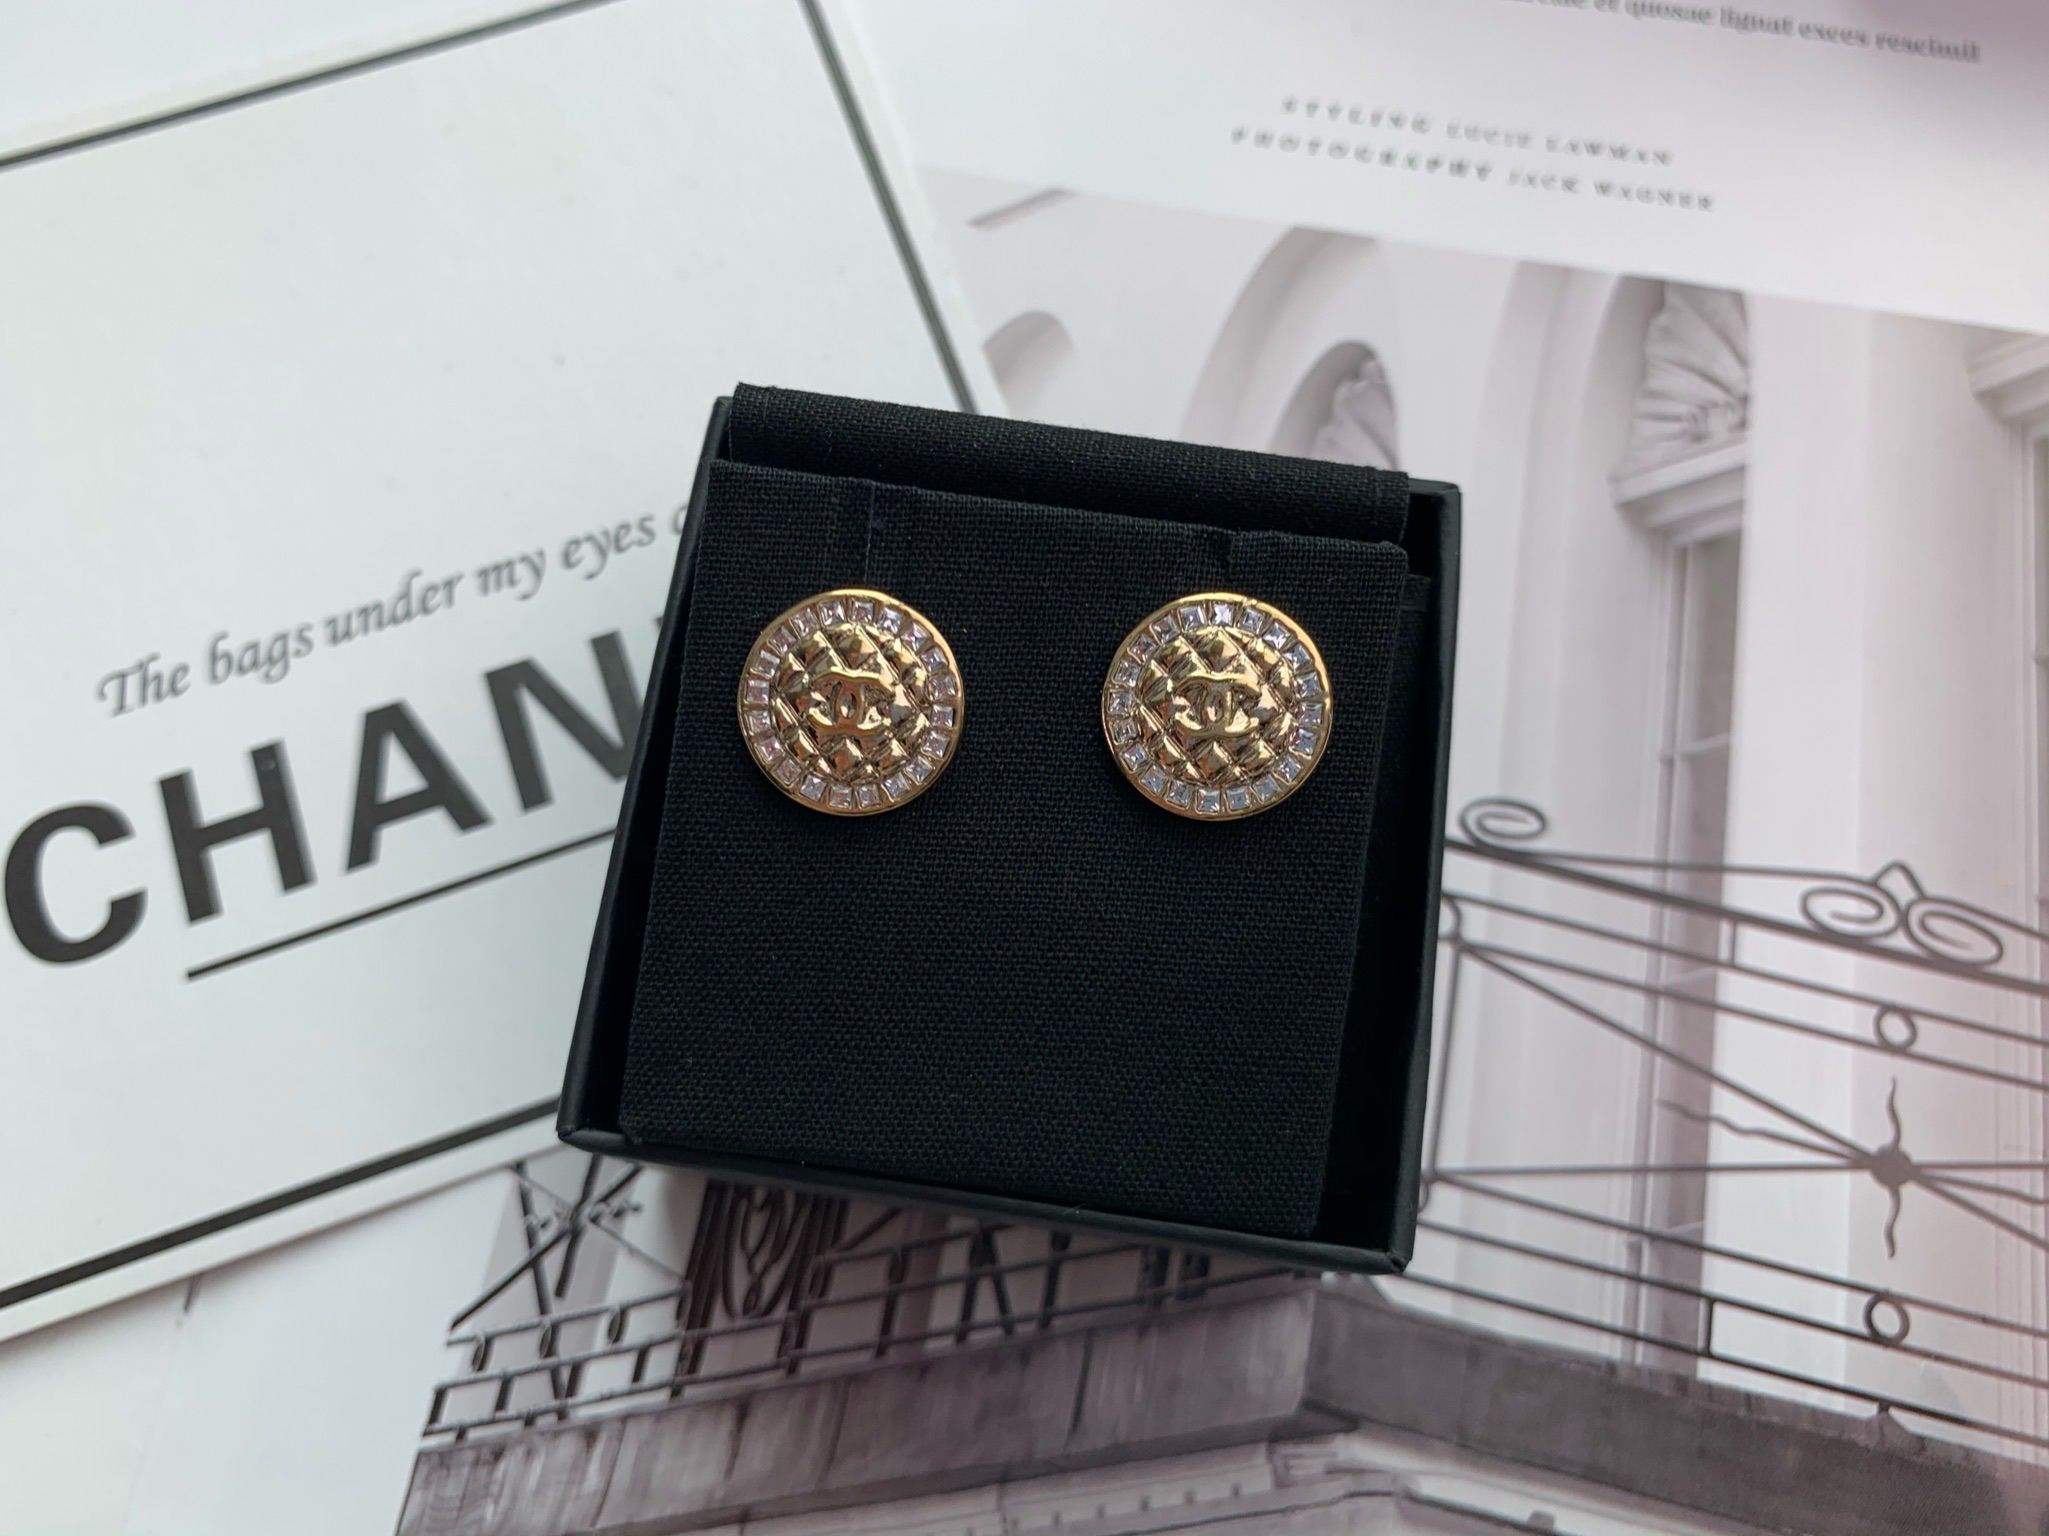 【CHANEL 】 金色水鑽菱格紋雙C圓型針式耳環